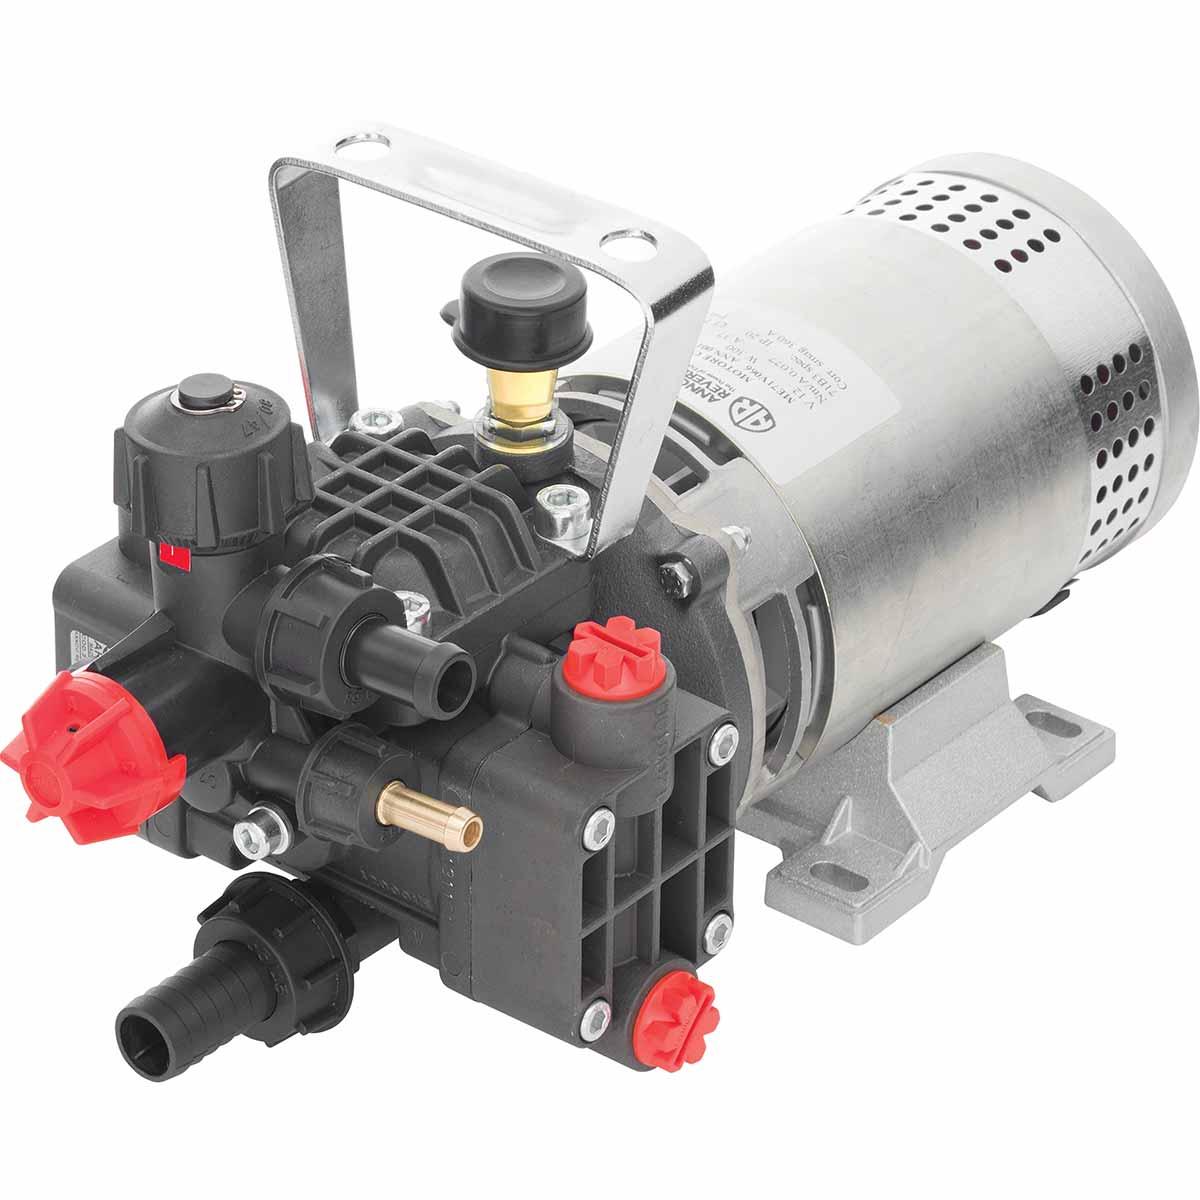 Annovi reverberi ar due vri 12 1450 rpm semi hydraulic two ar due vri 12 ccuart Choice Image